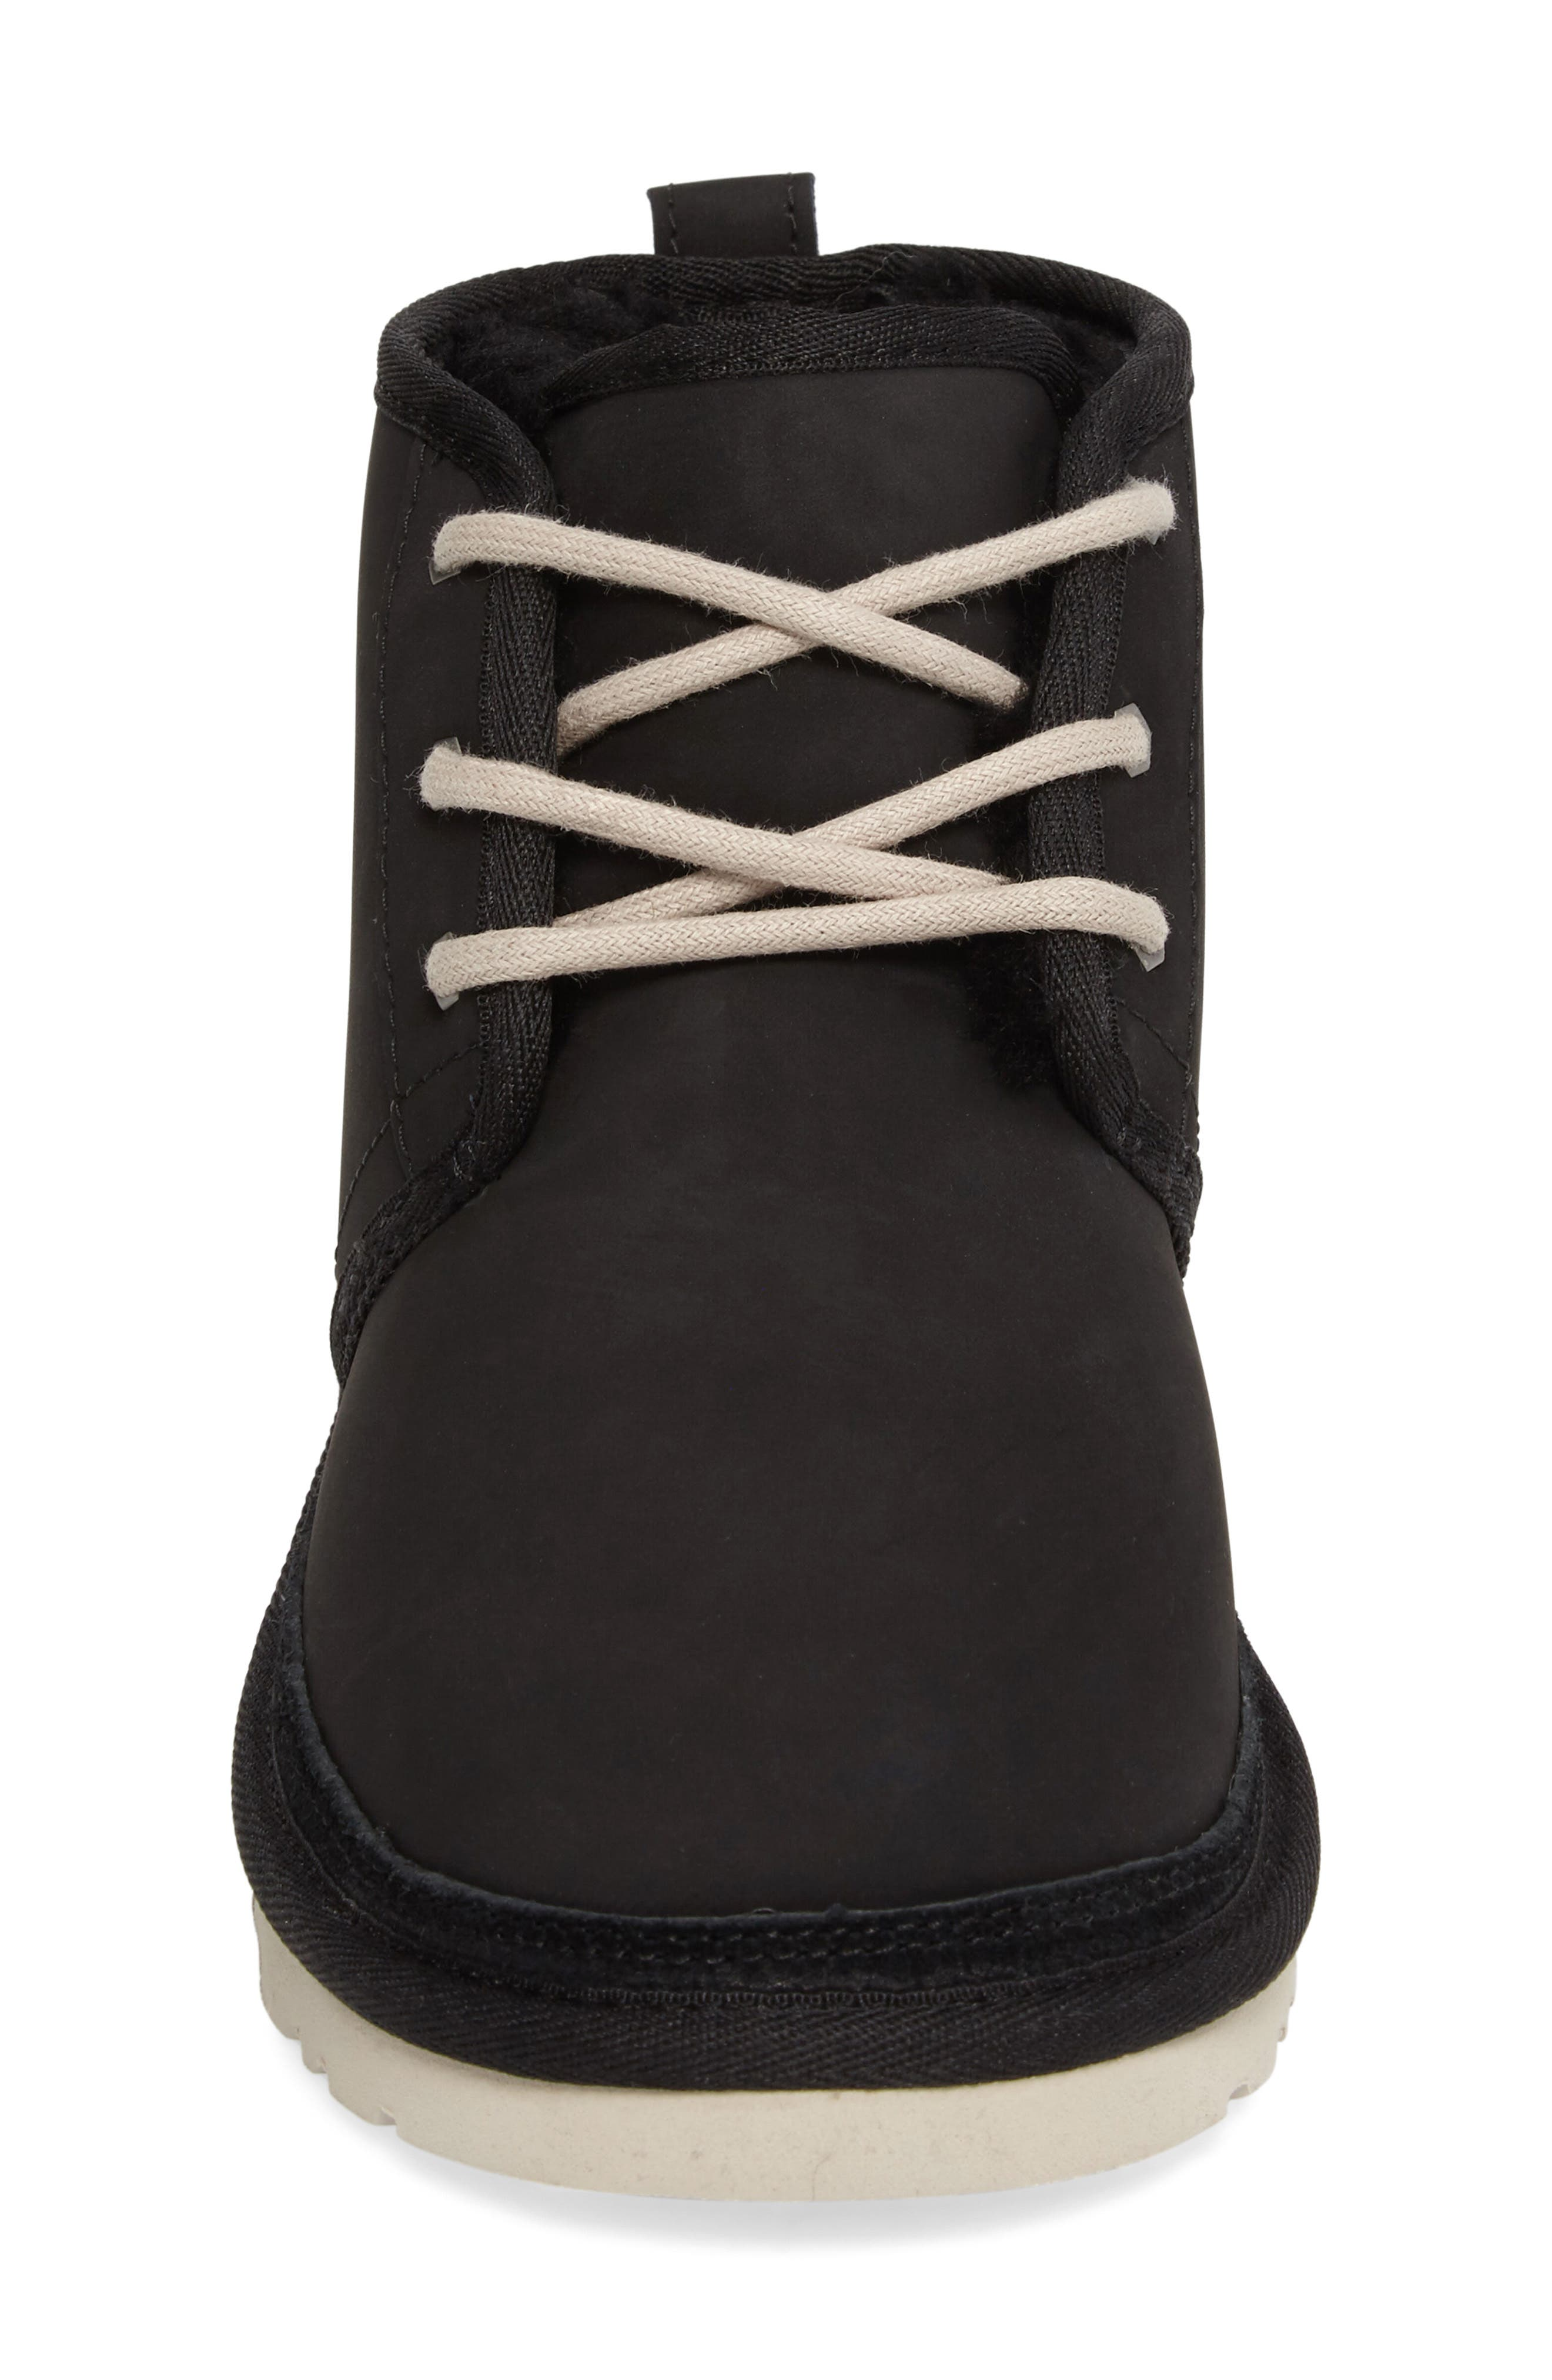 Neumel Genuine Shearling Boot,                             Alternate thumbnail 4, color,                             002